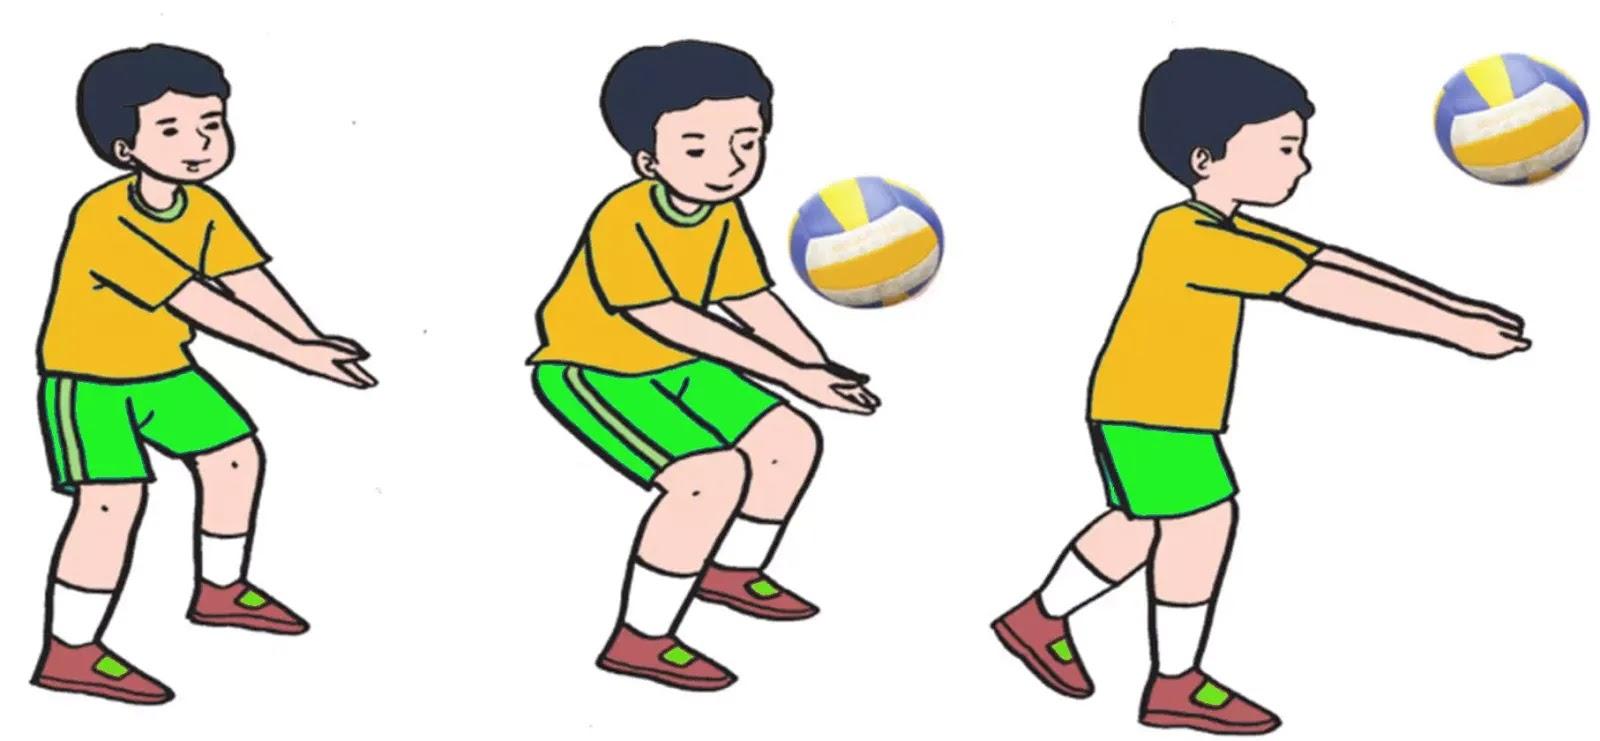 Bagaimana Cara Melakukan Teknik Passing Bawah Bola Voli